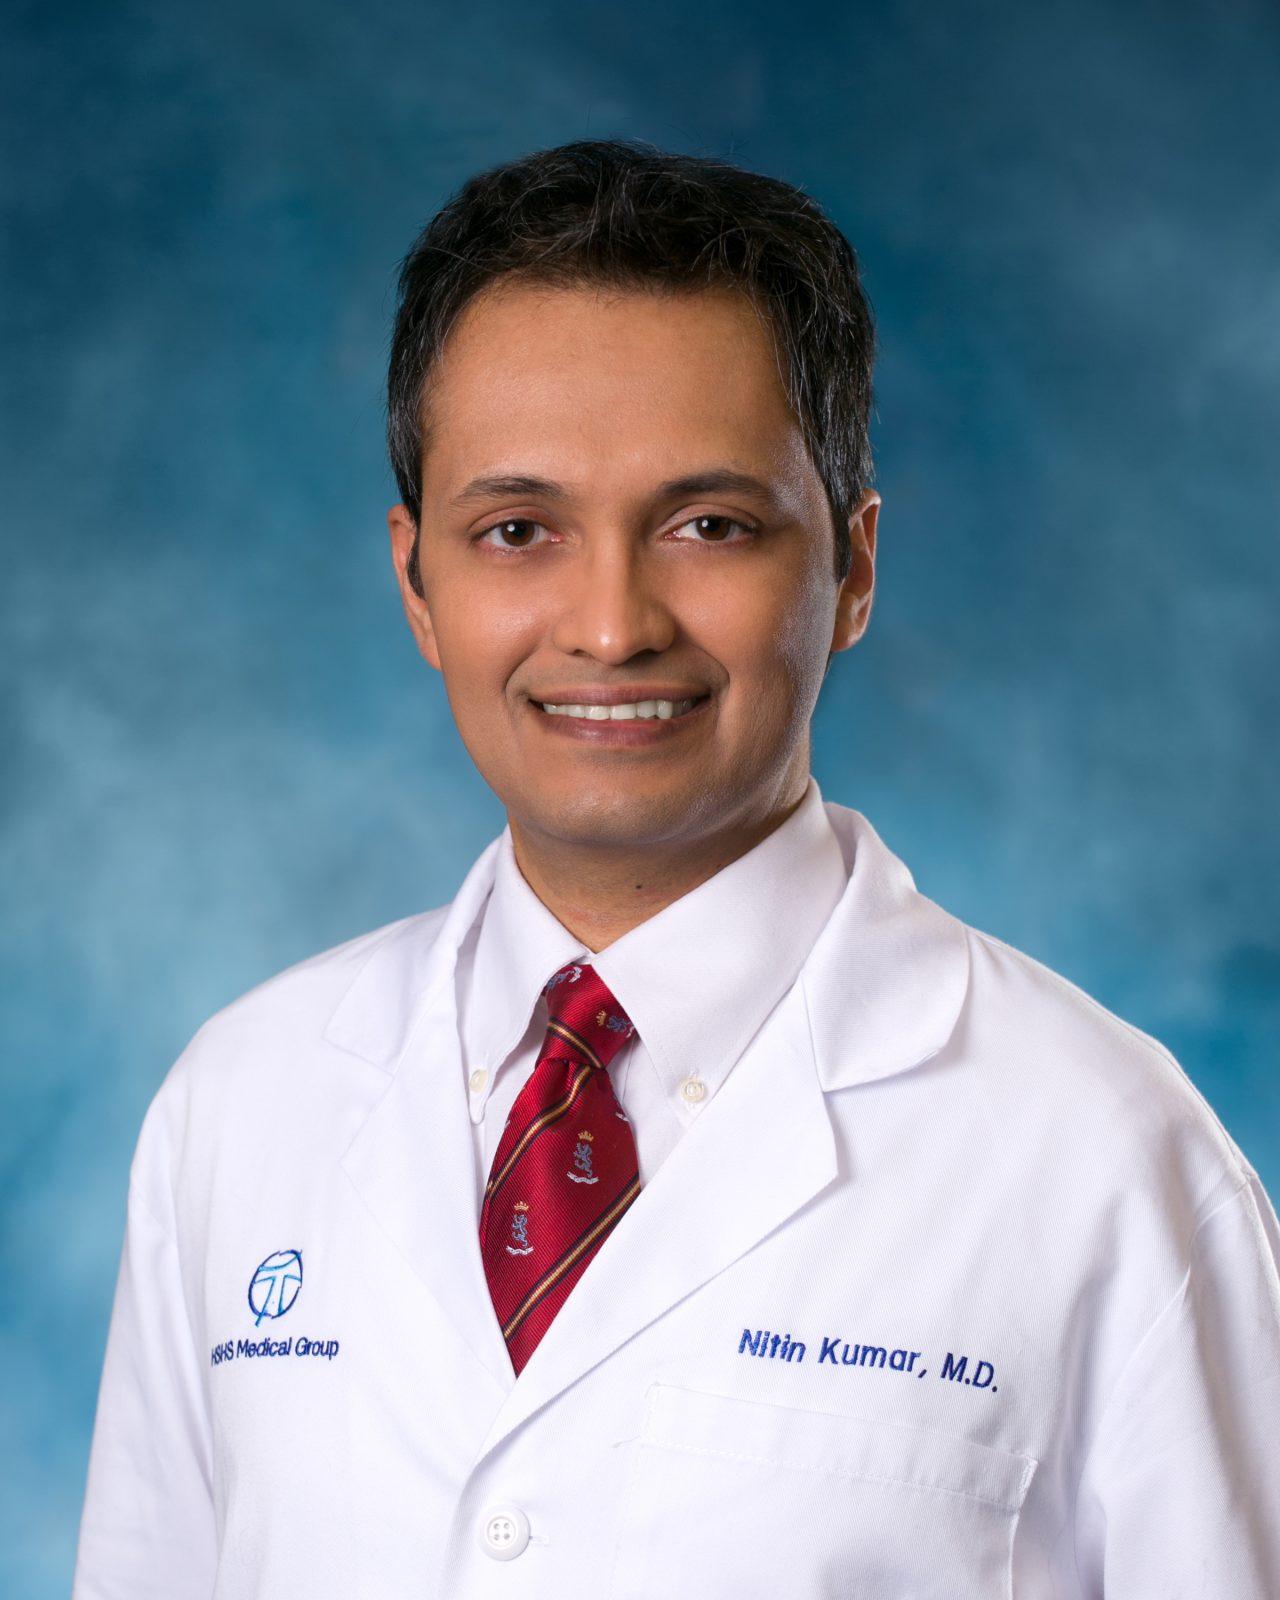 Hshs Medical Group S Nitin Kumar Md Gastroenterologist Brings